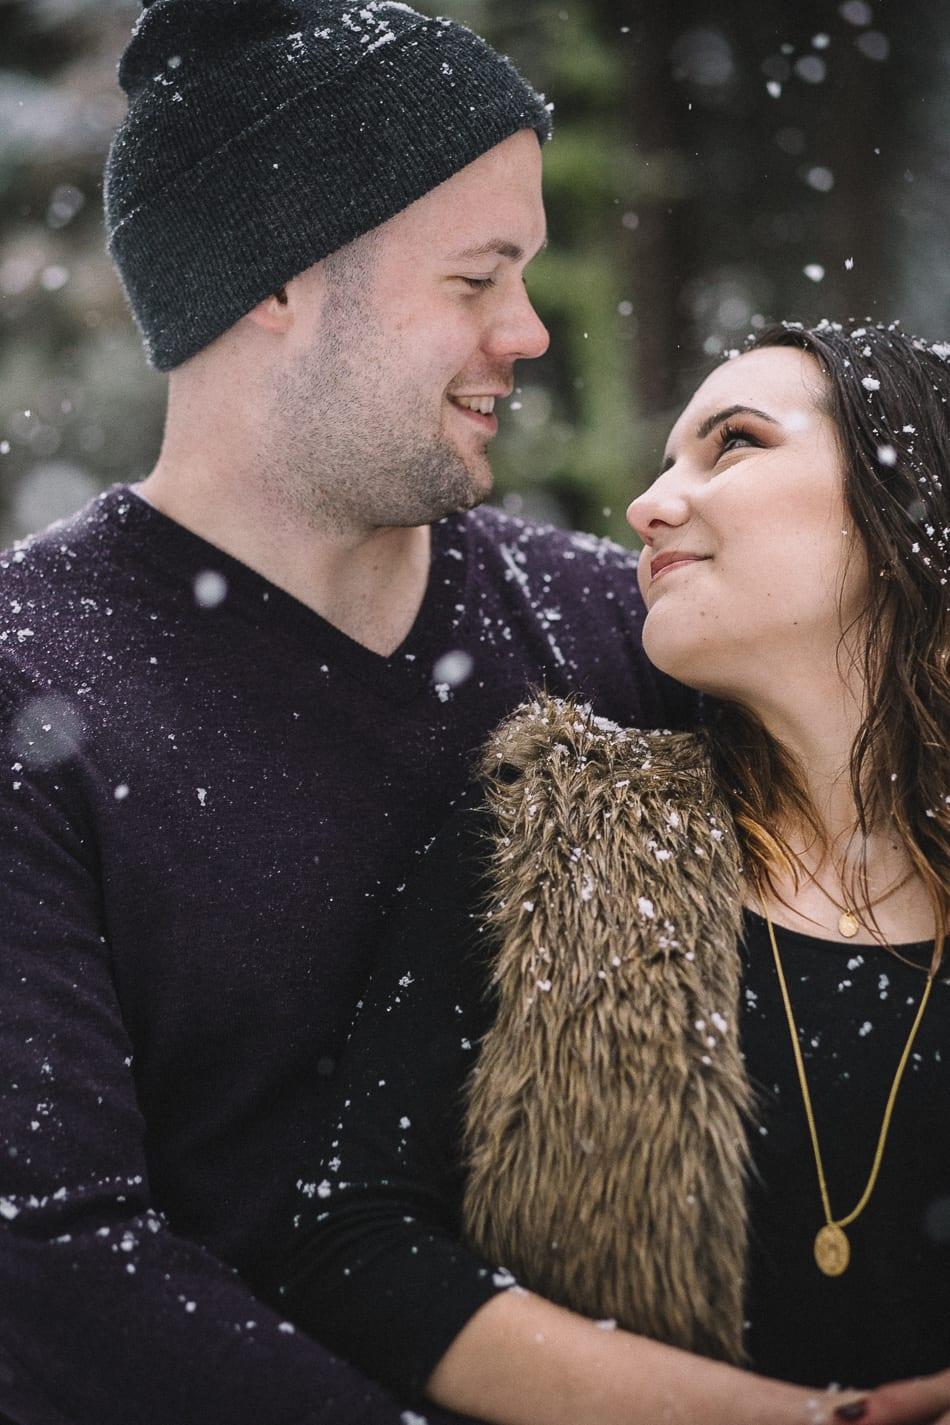 mount-lassen-winter-engagement-photo-6